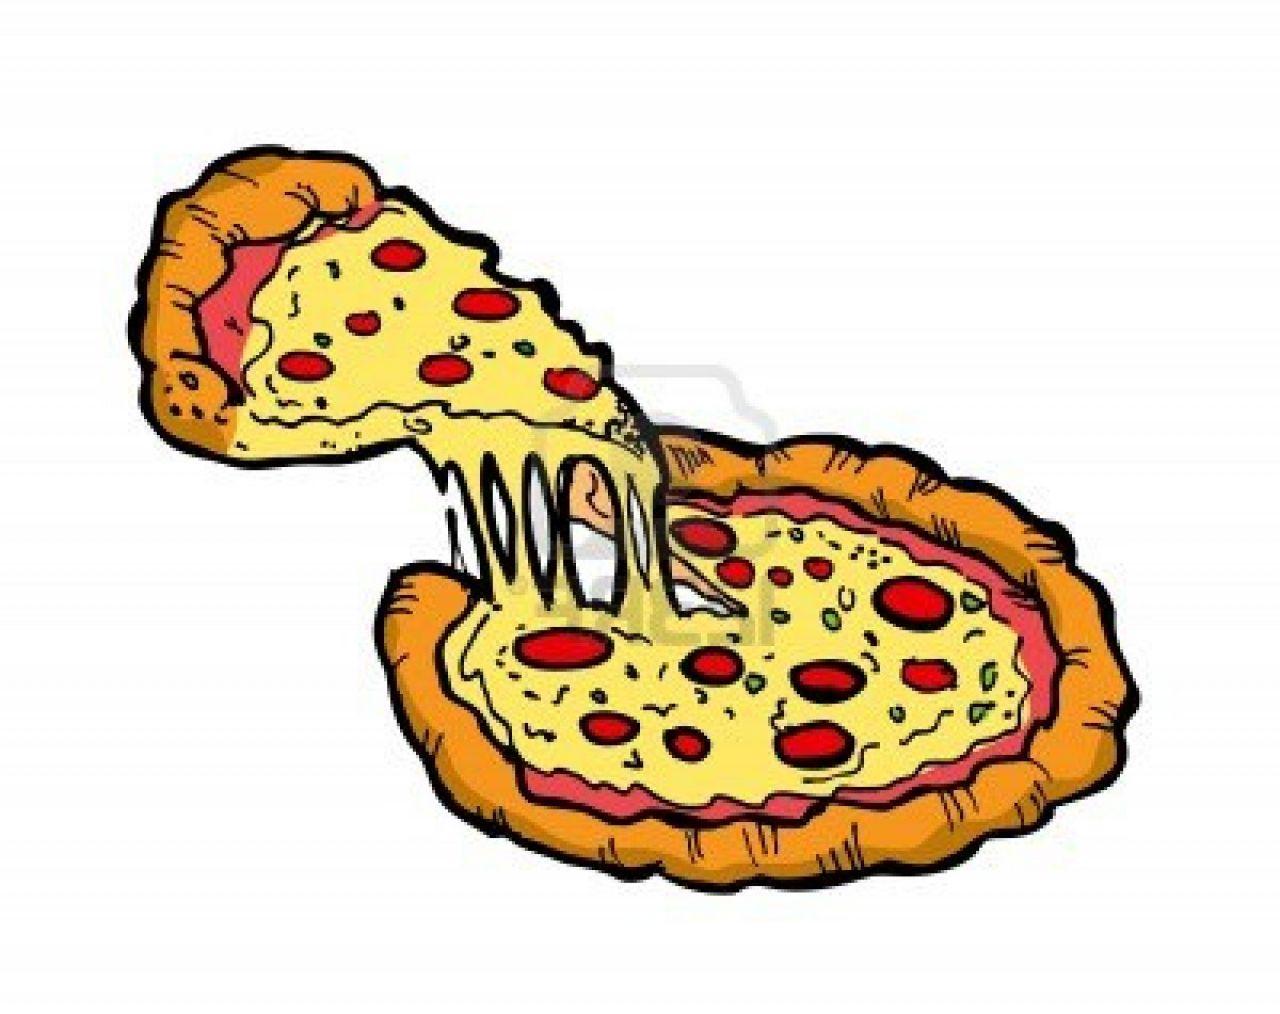 1280x1014 Group Of Pizza Clip Art Cartoon